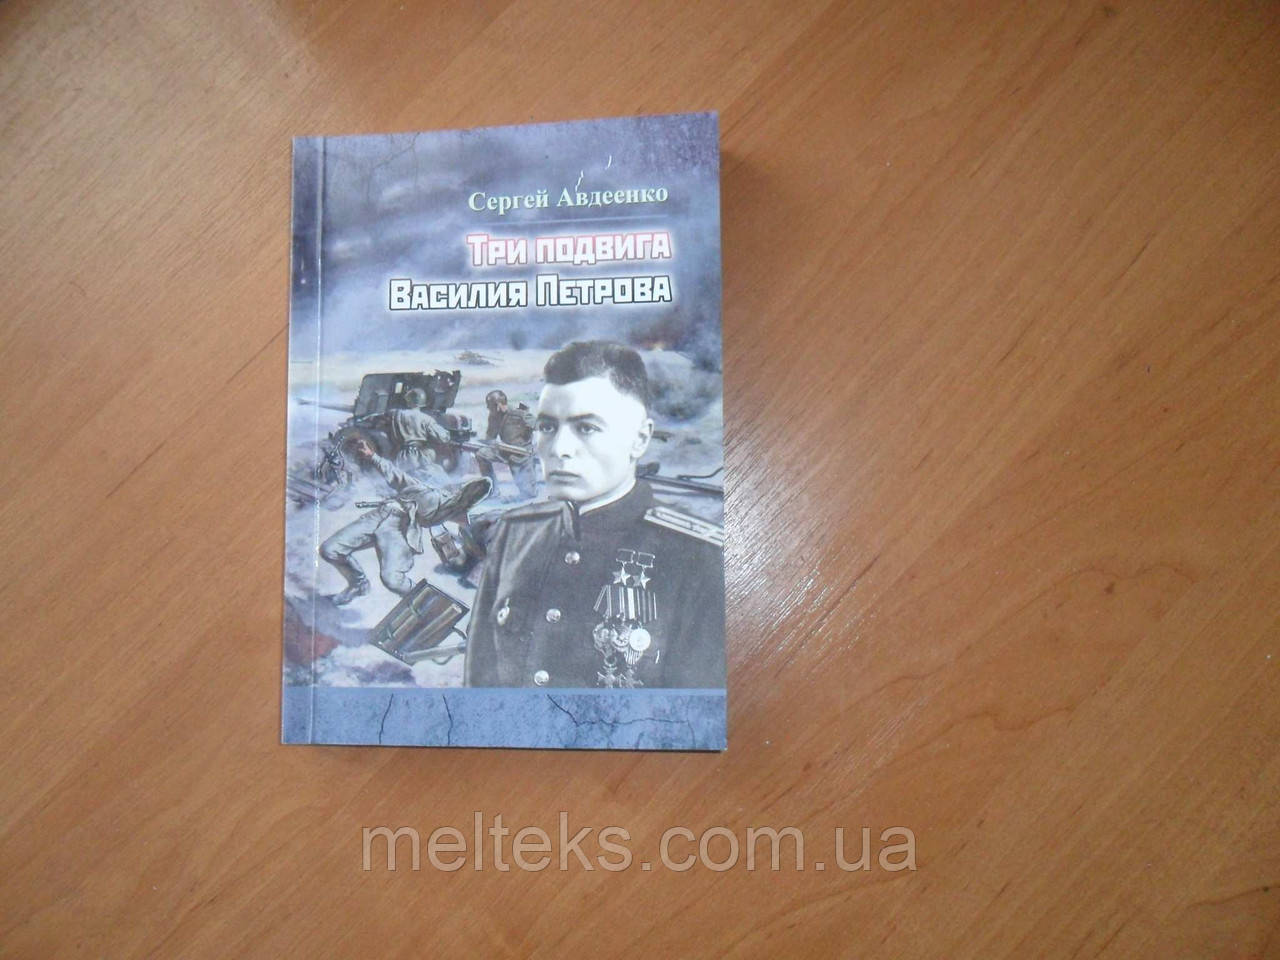 Три подвига Василия Петрова (книга Сергея Авдеенко)